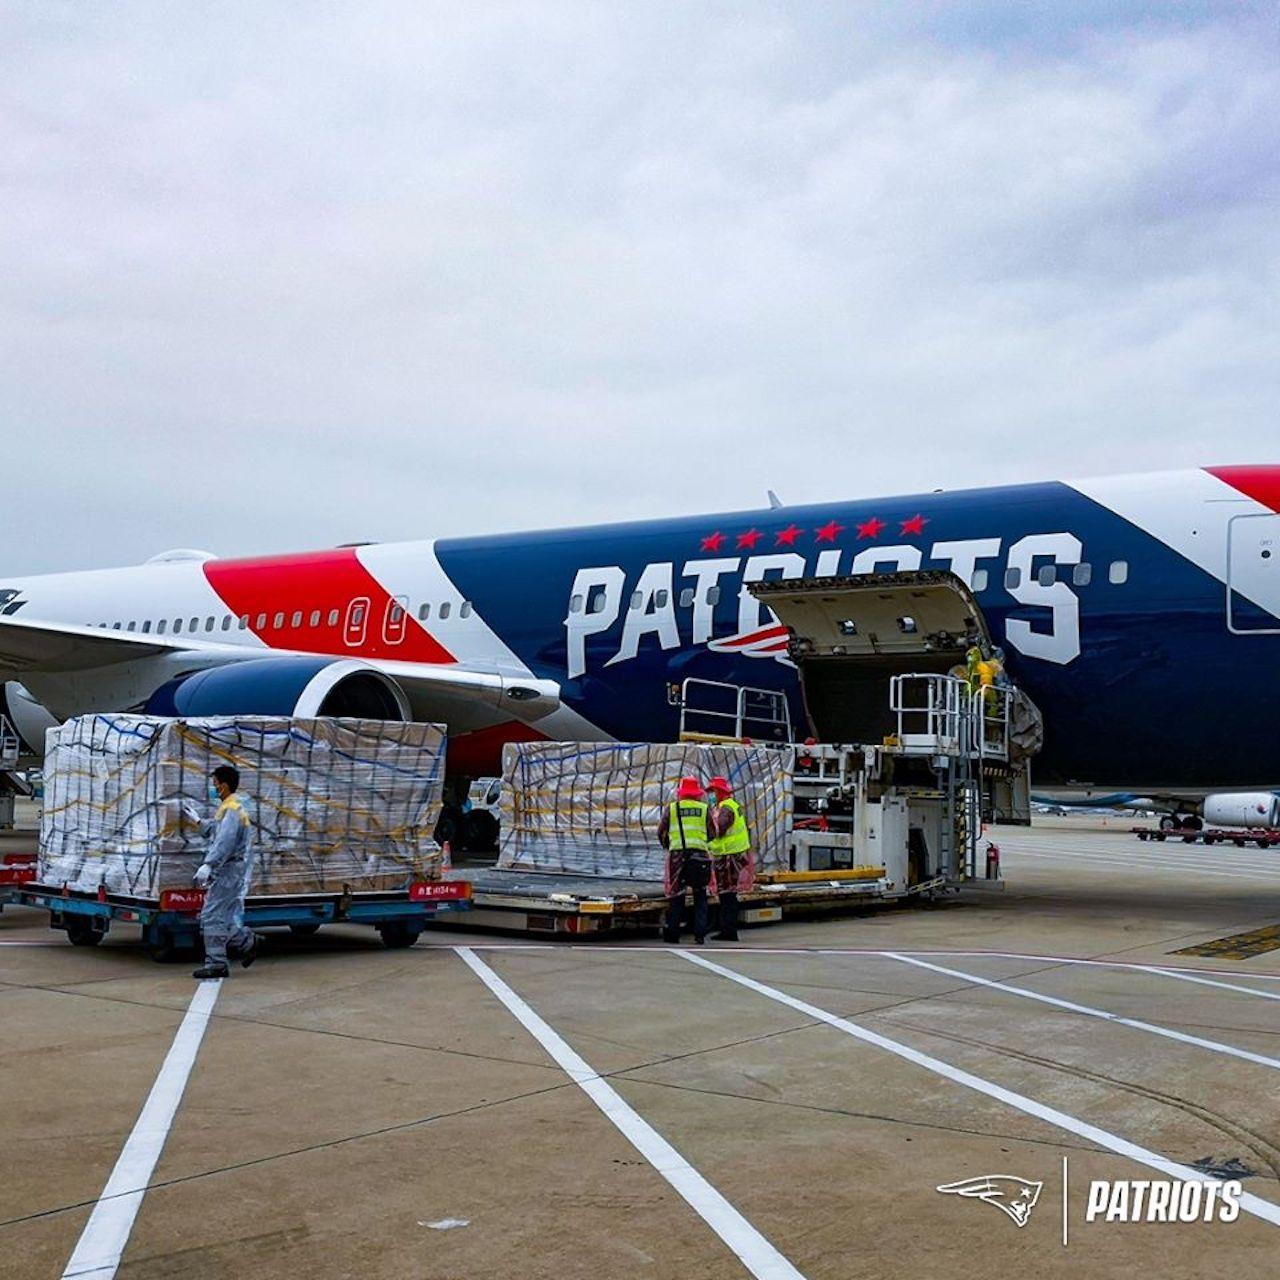 New England Patriots plane N95 masks